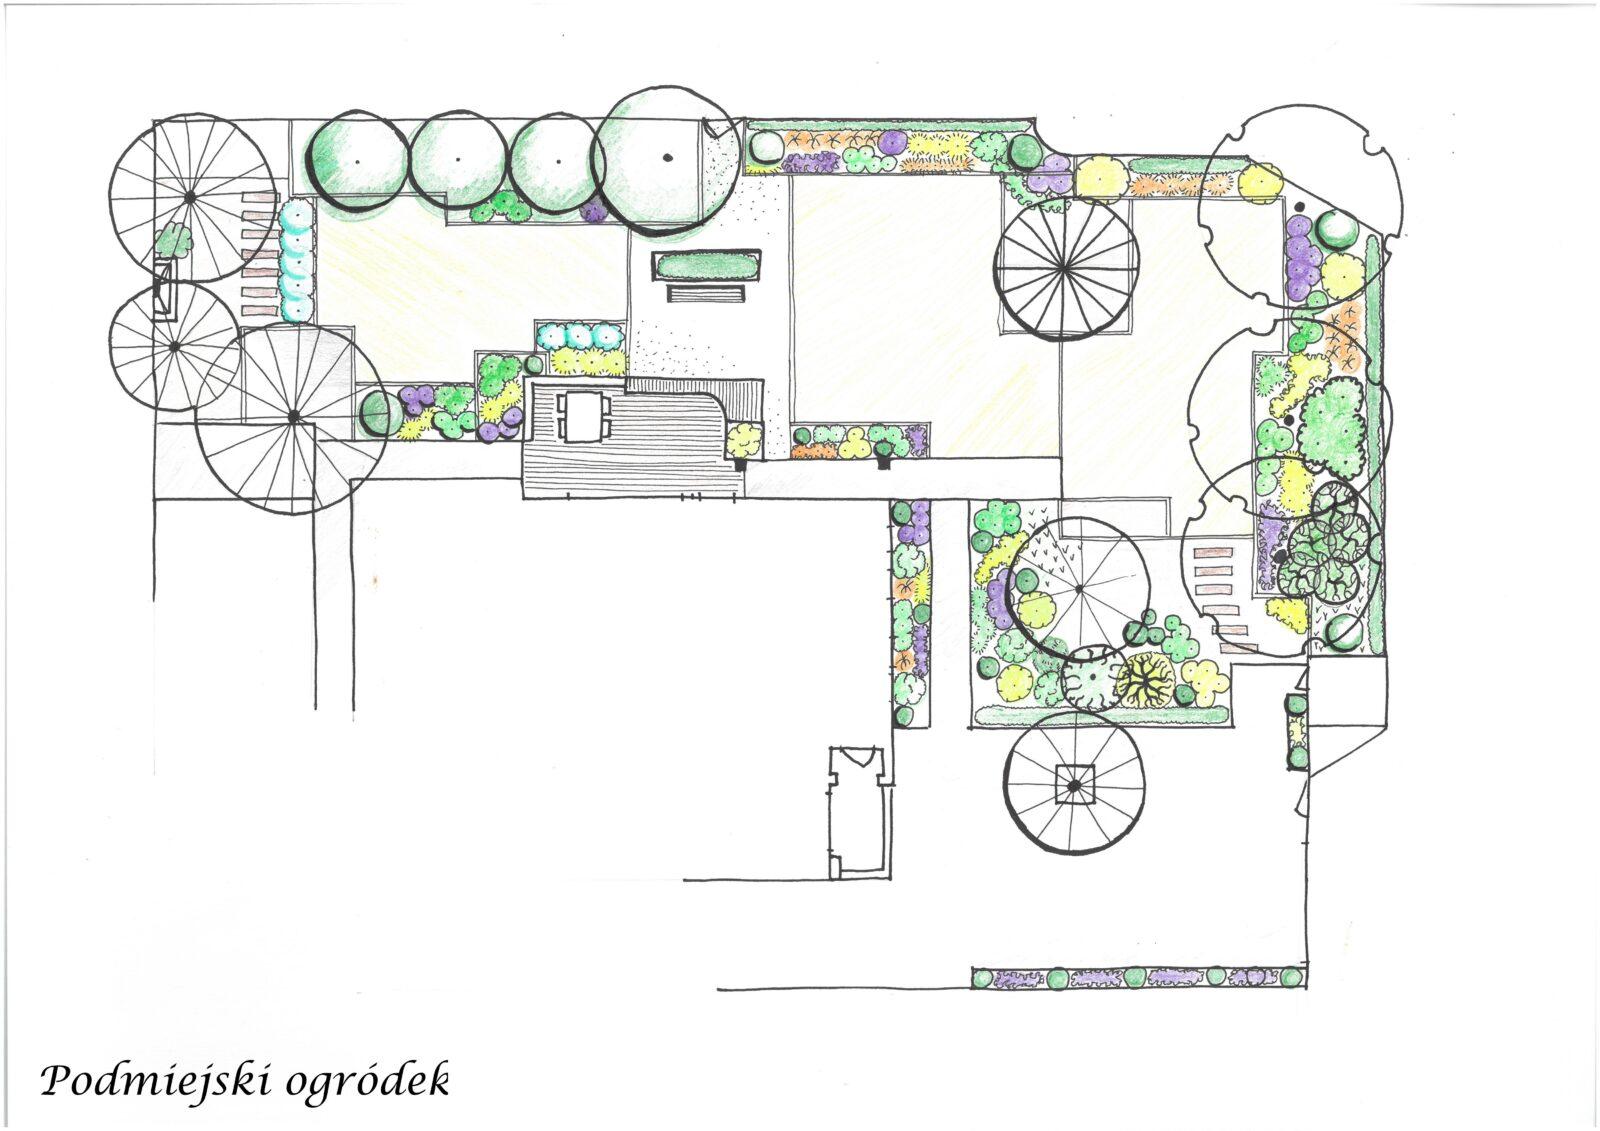 oryginalny projekt ogrodu